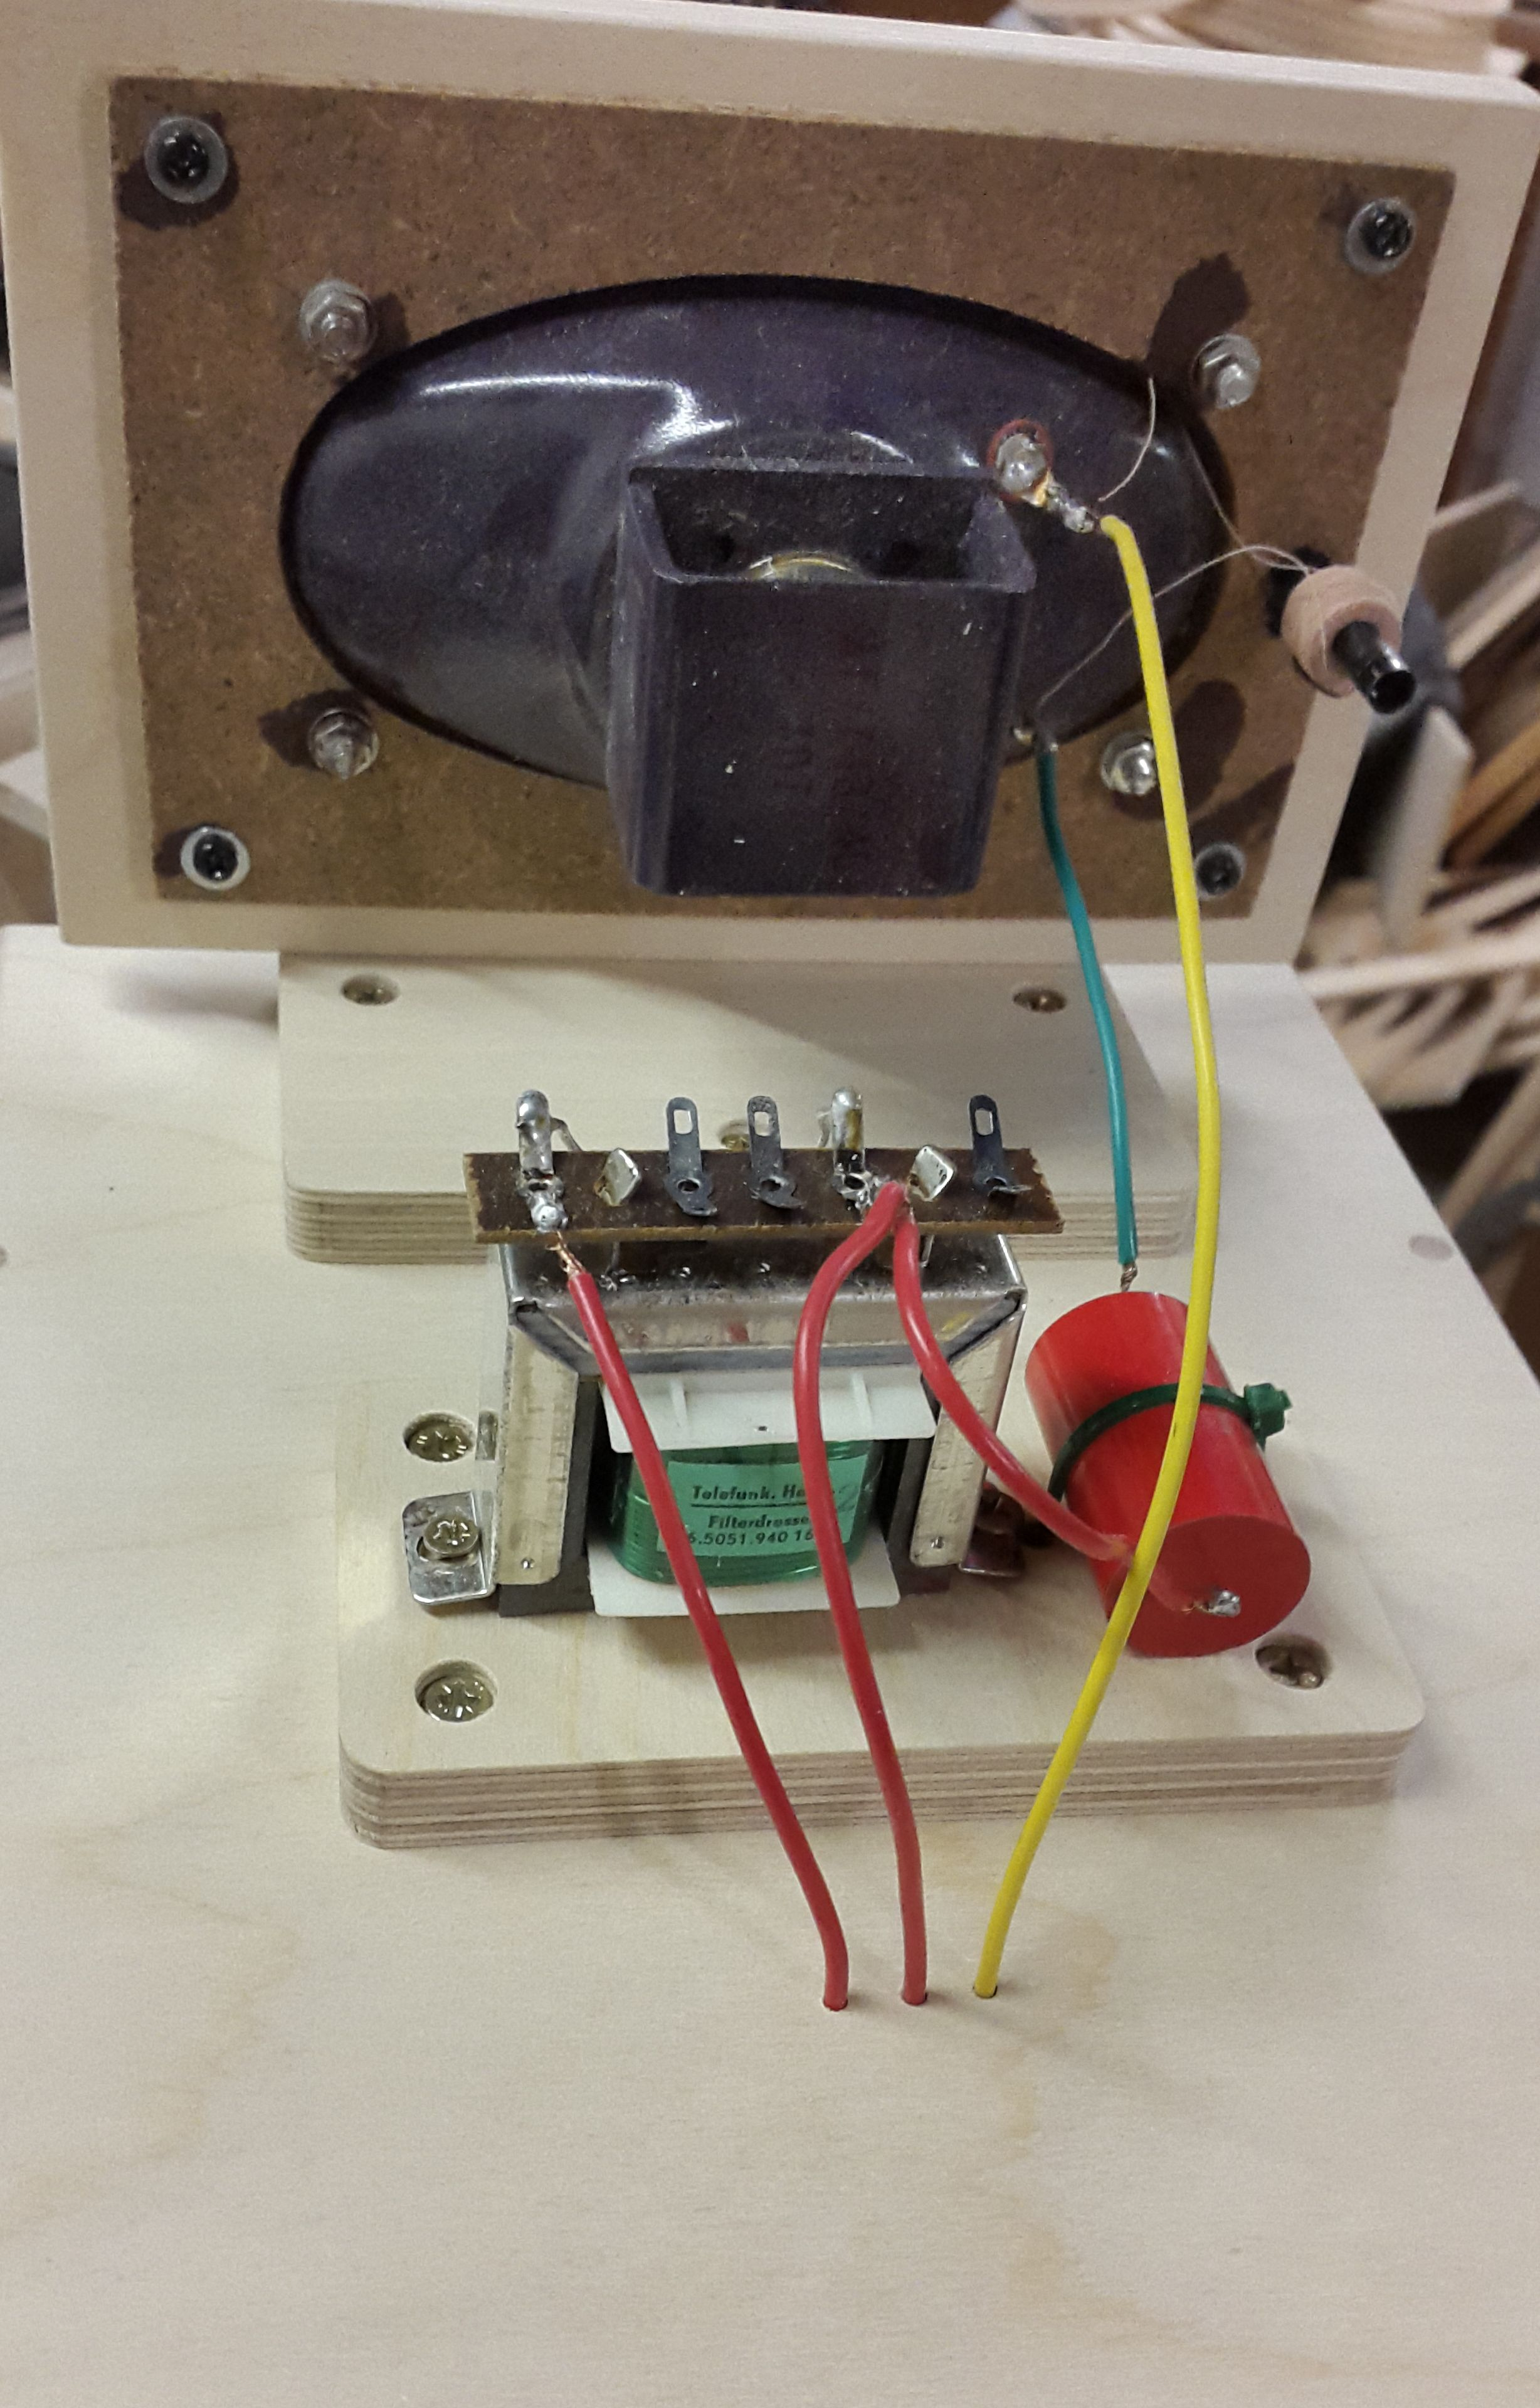 hight resolution of telefunky telefunken inductor metalised polypropylene film capacitor wire wound resistor